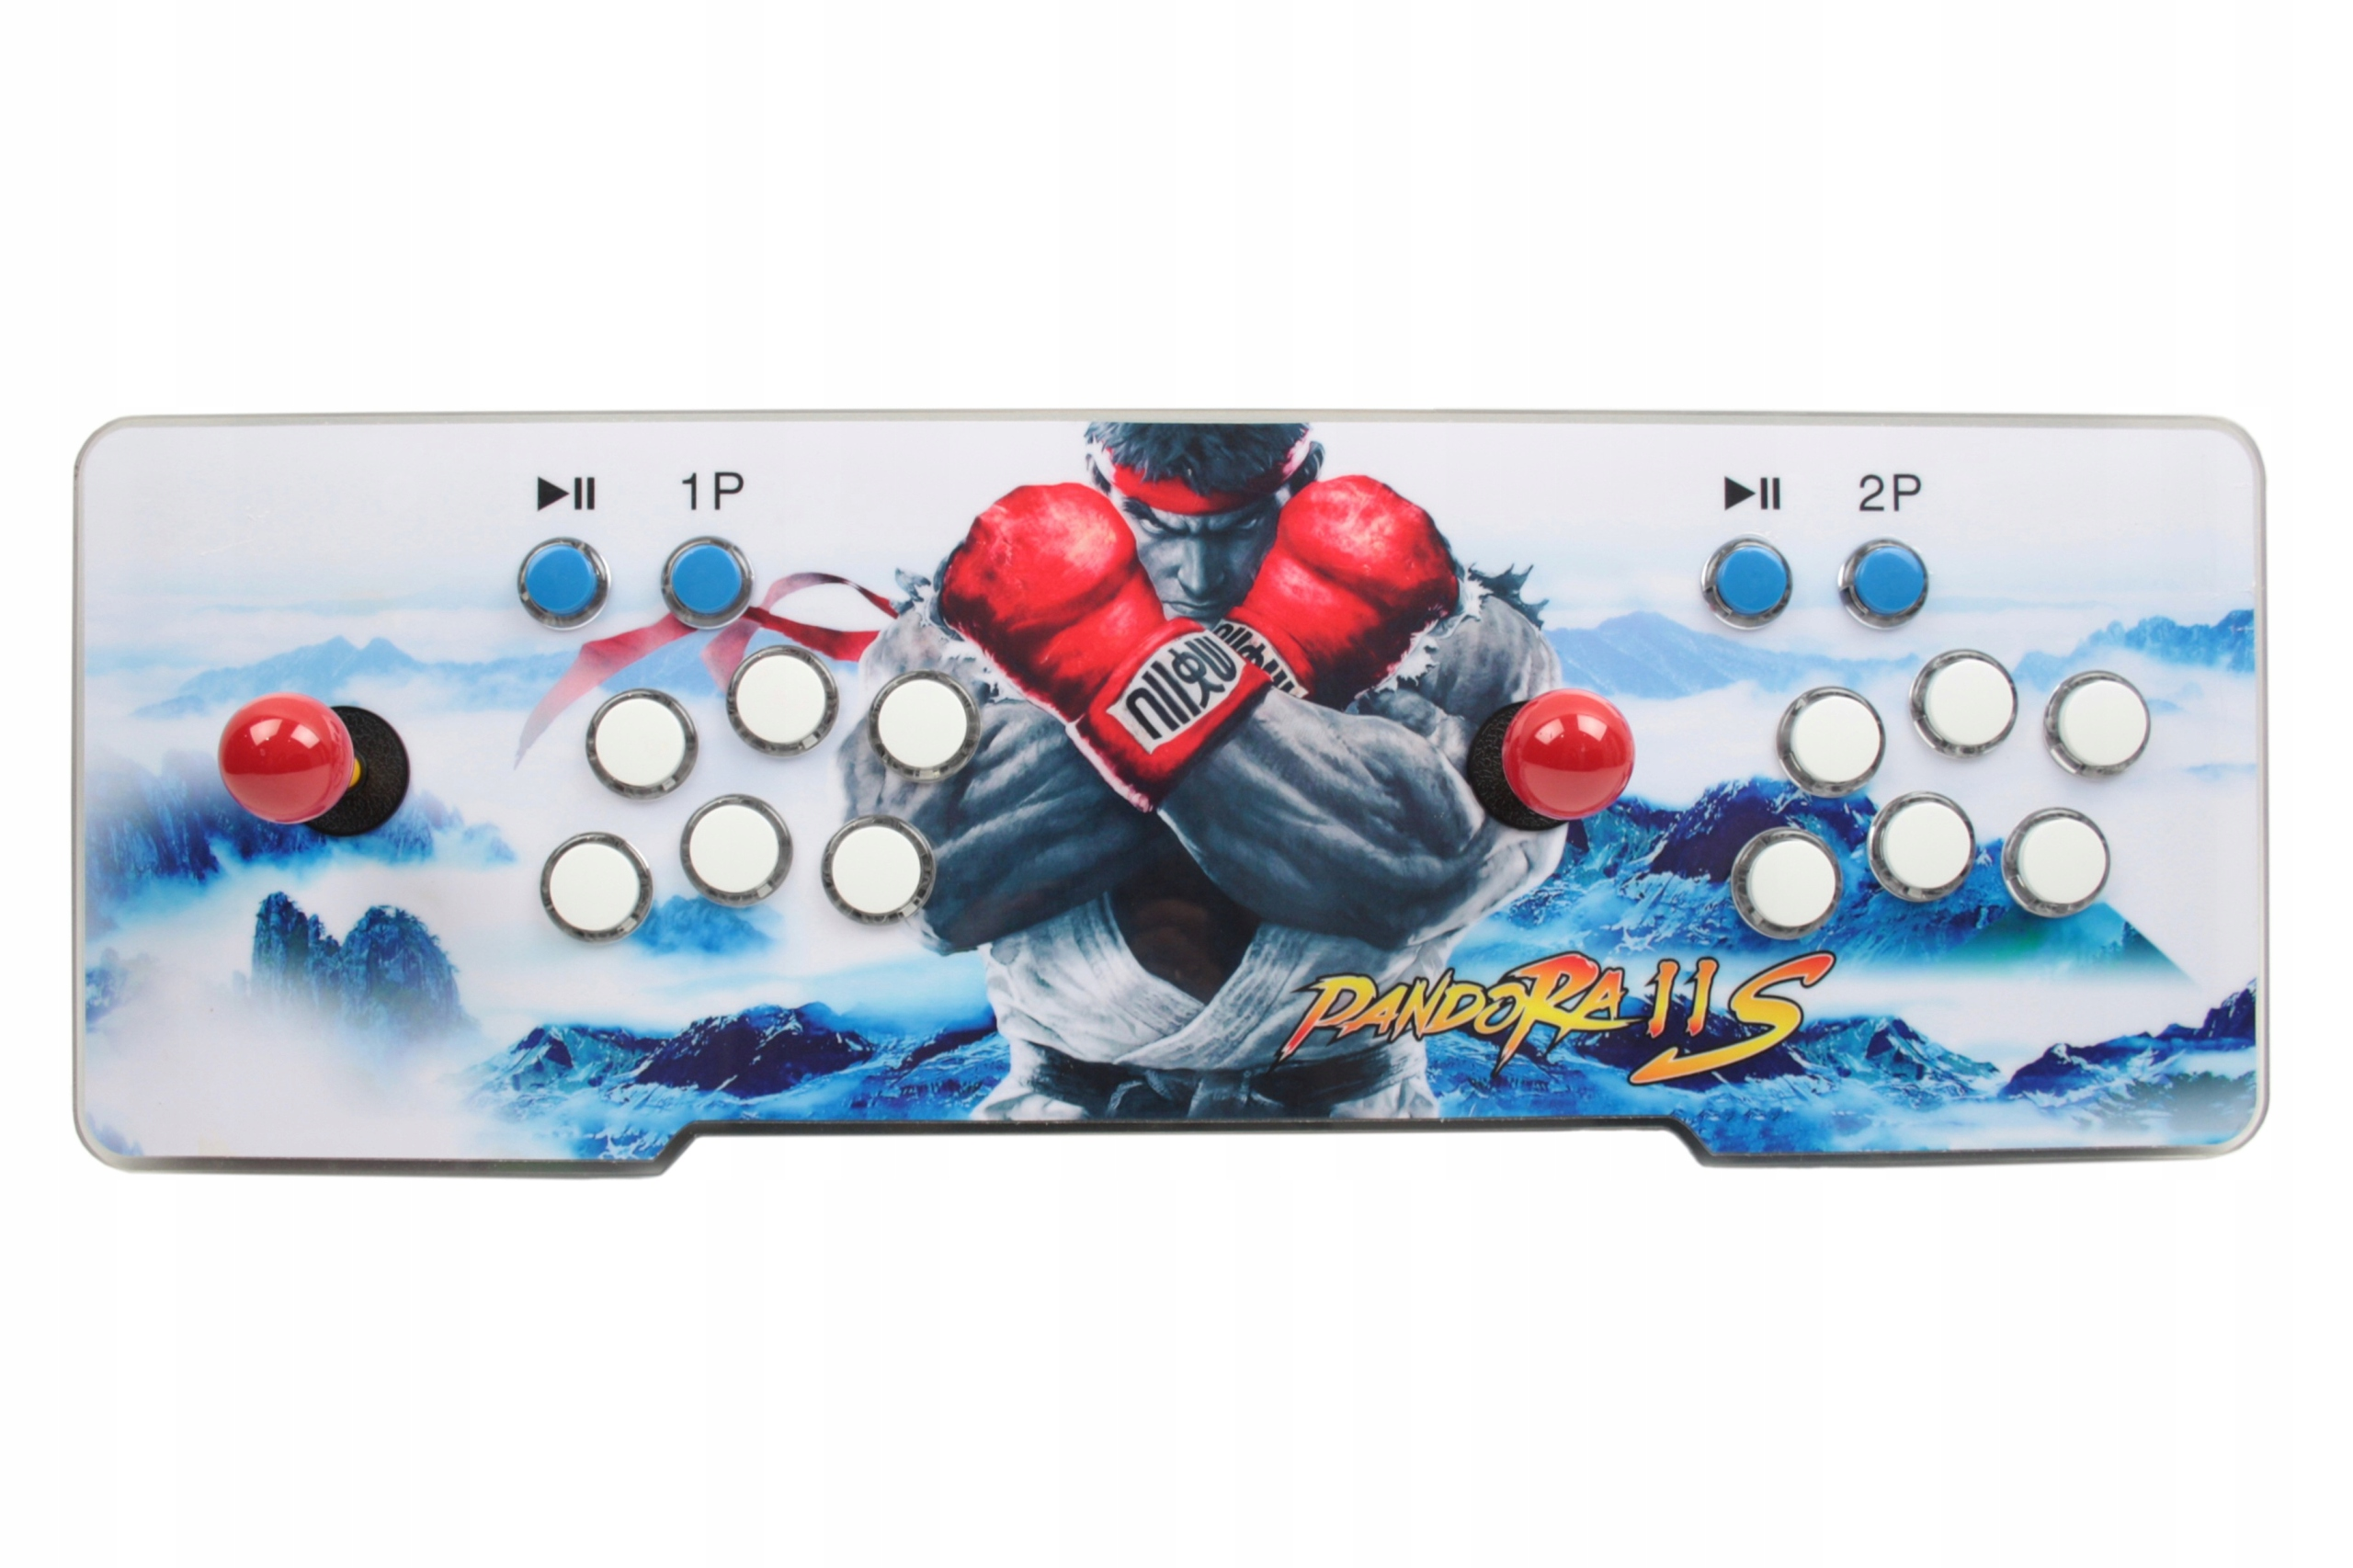 Pandora Console Box 11s - 3003 Hry Arcade 720P 3D